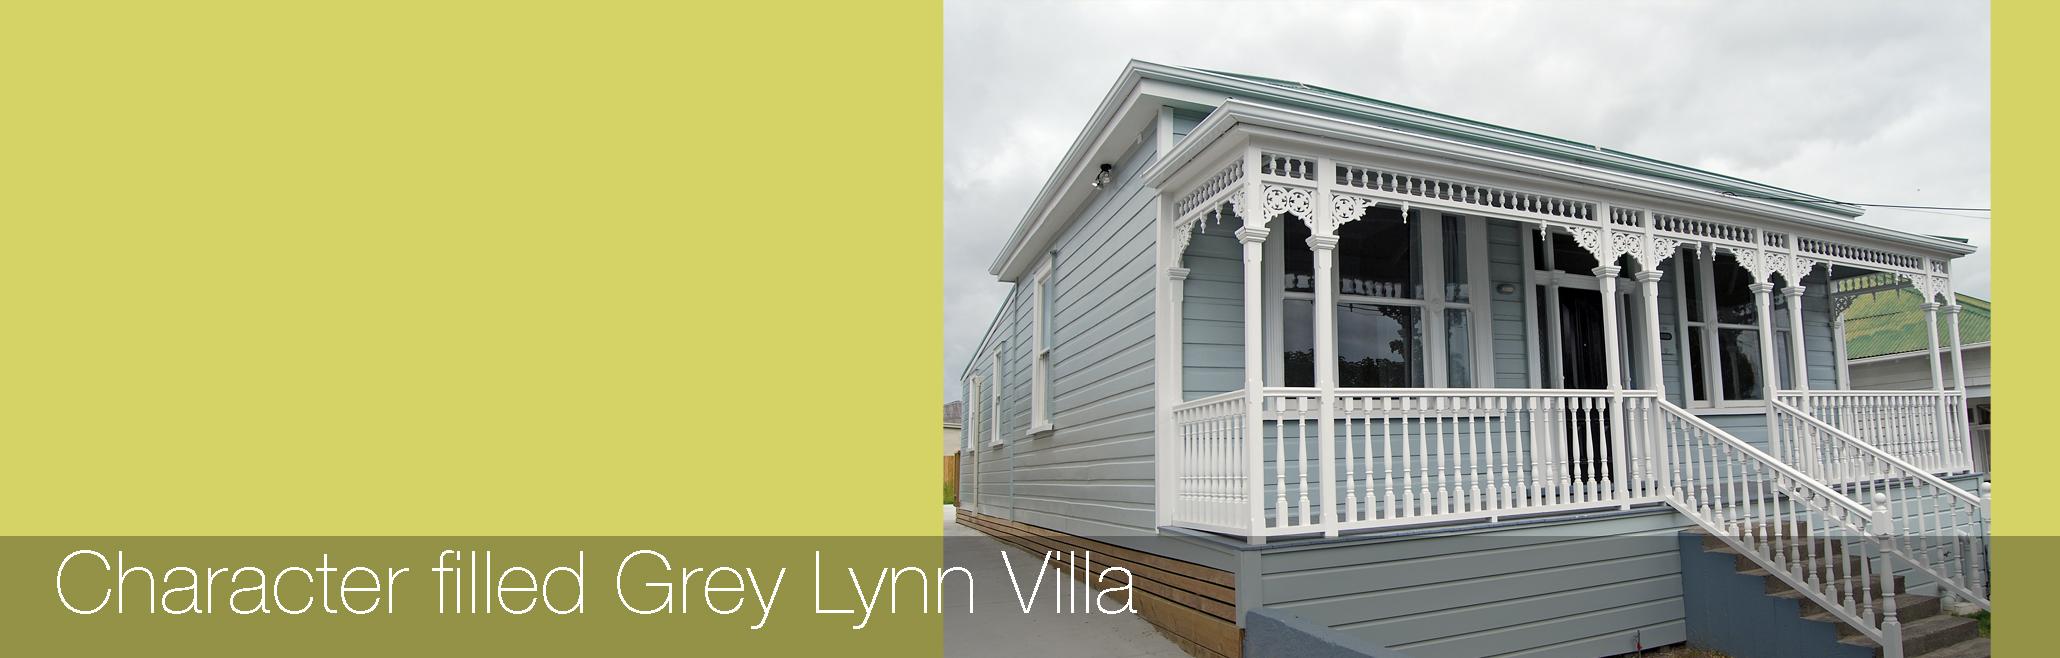 Villa photo banner